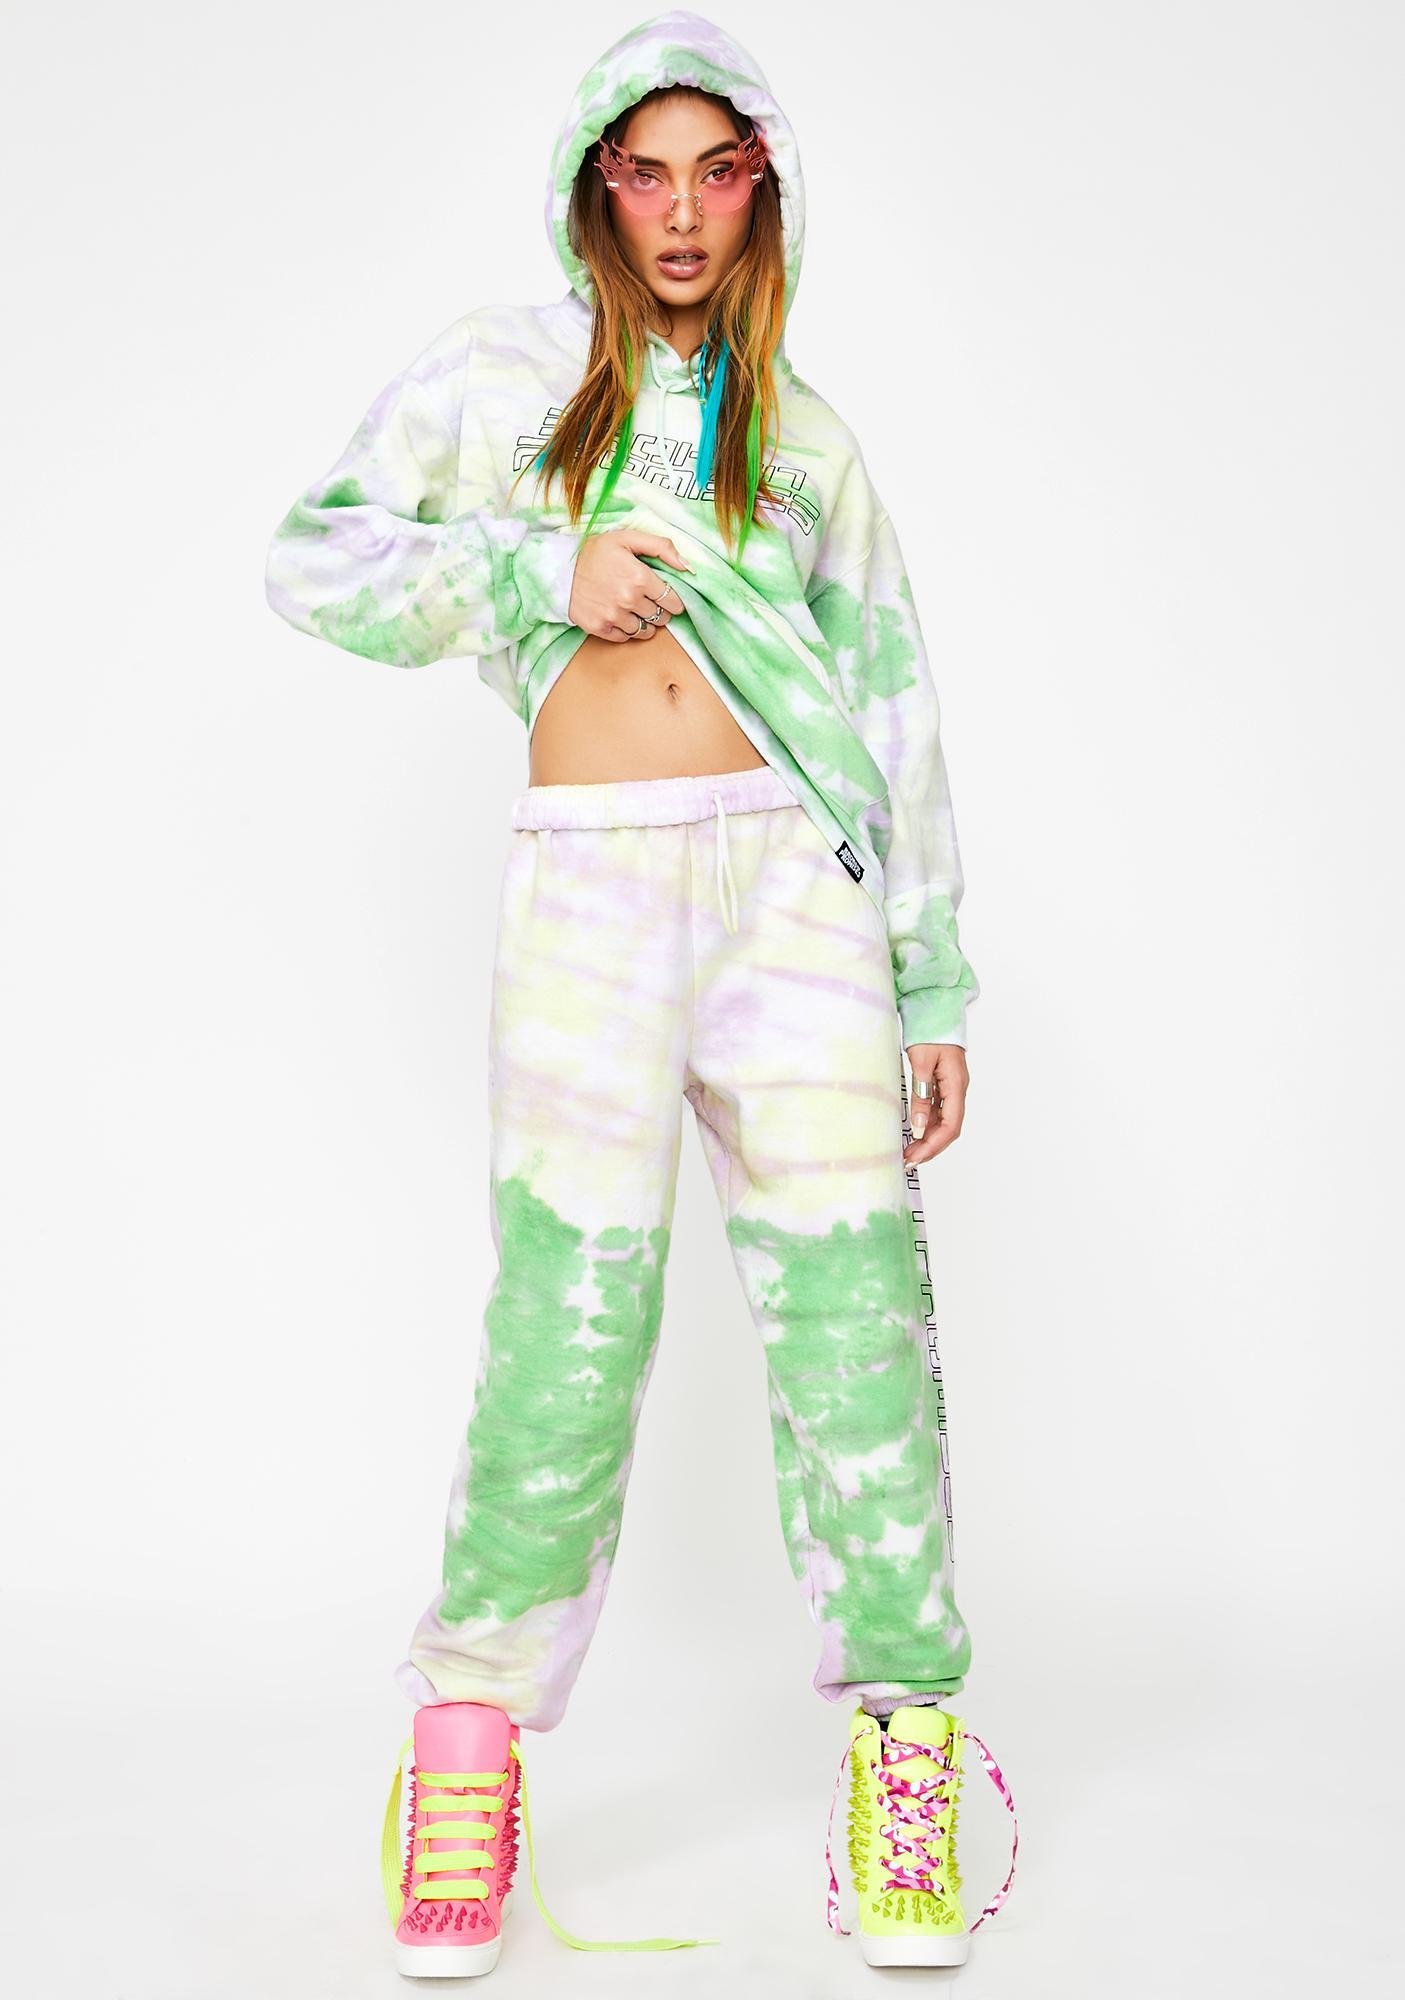 BROKEN PROMISES CO Spaced Out Tie Dye Sweatpants